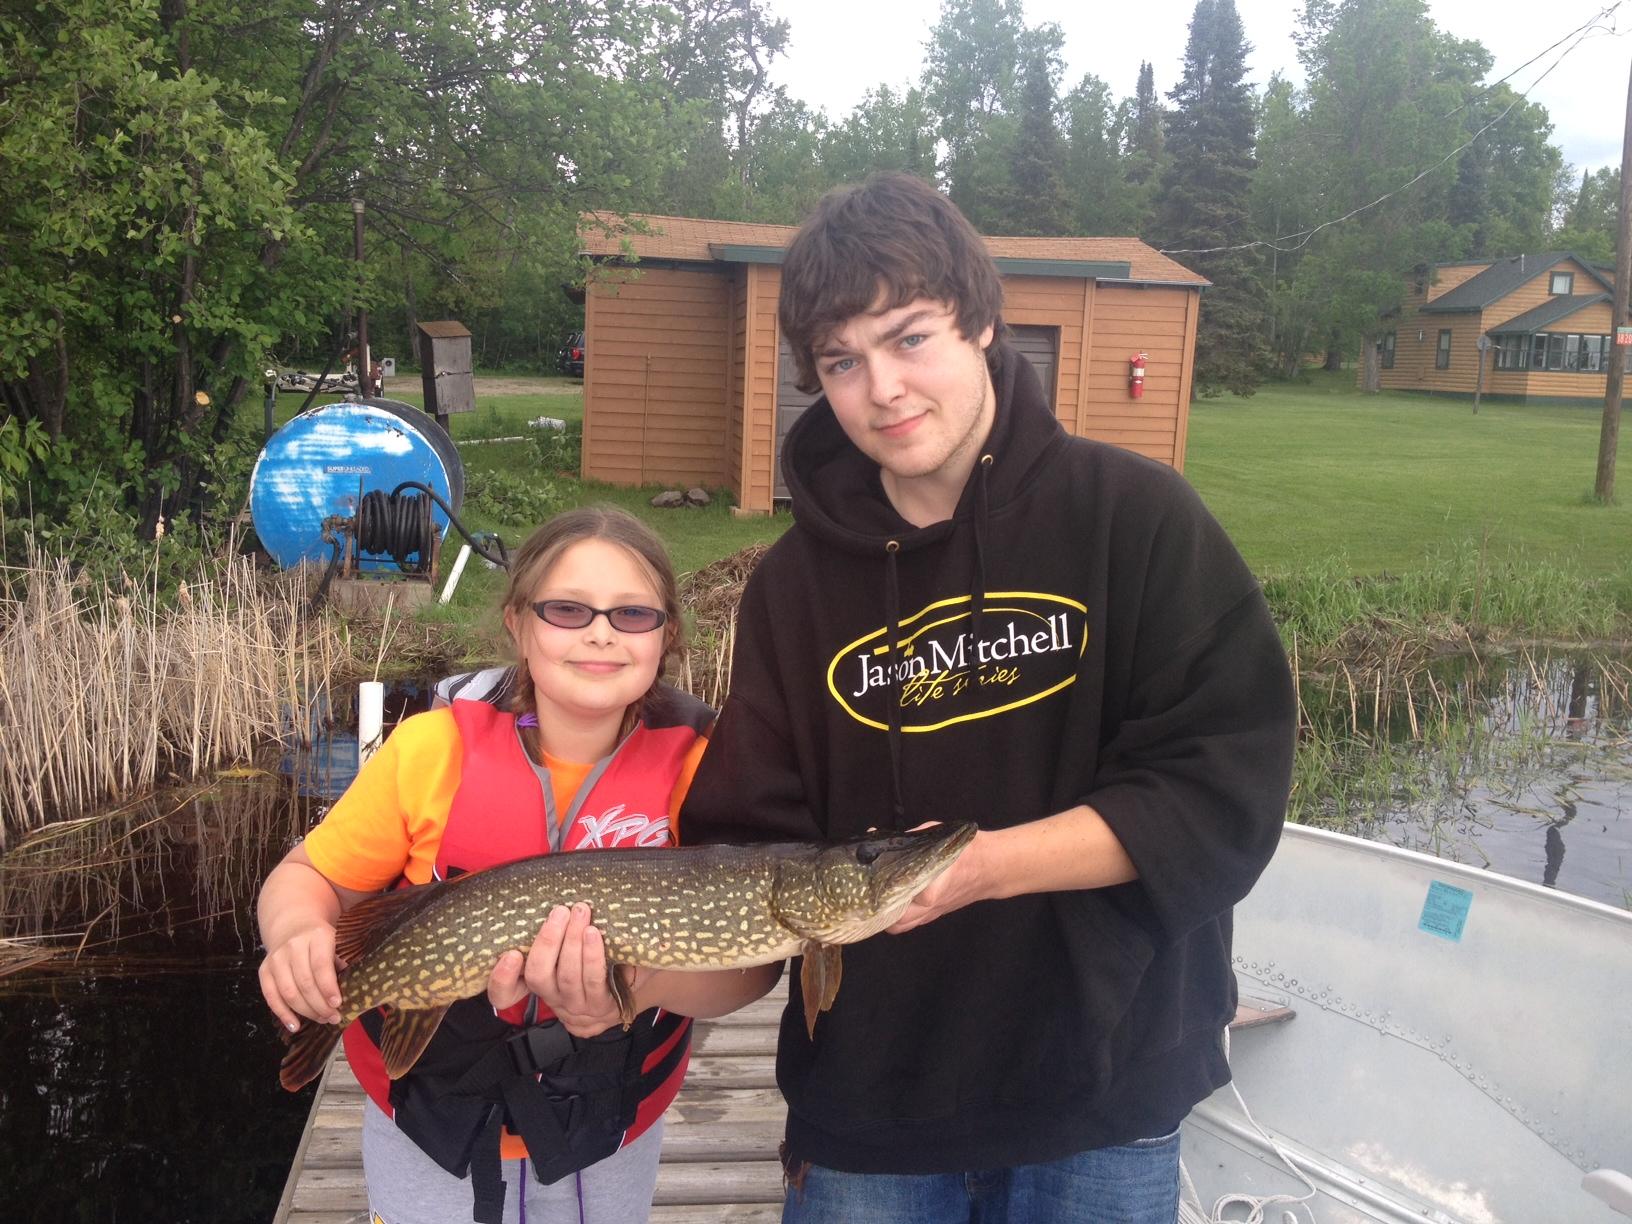 Lake vermilion fishing report june 23 2014 everett for Lake vermilion fishing report